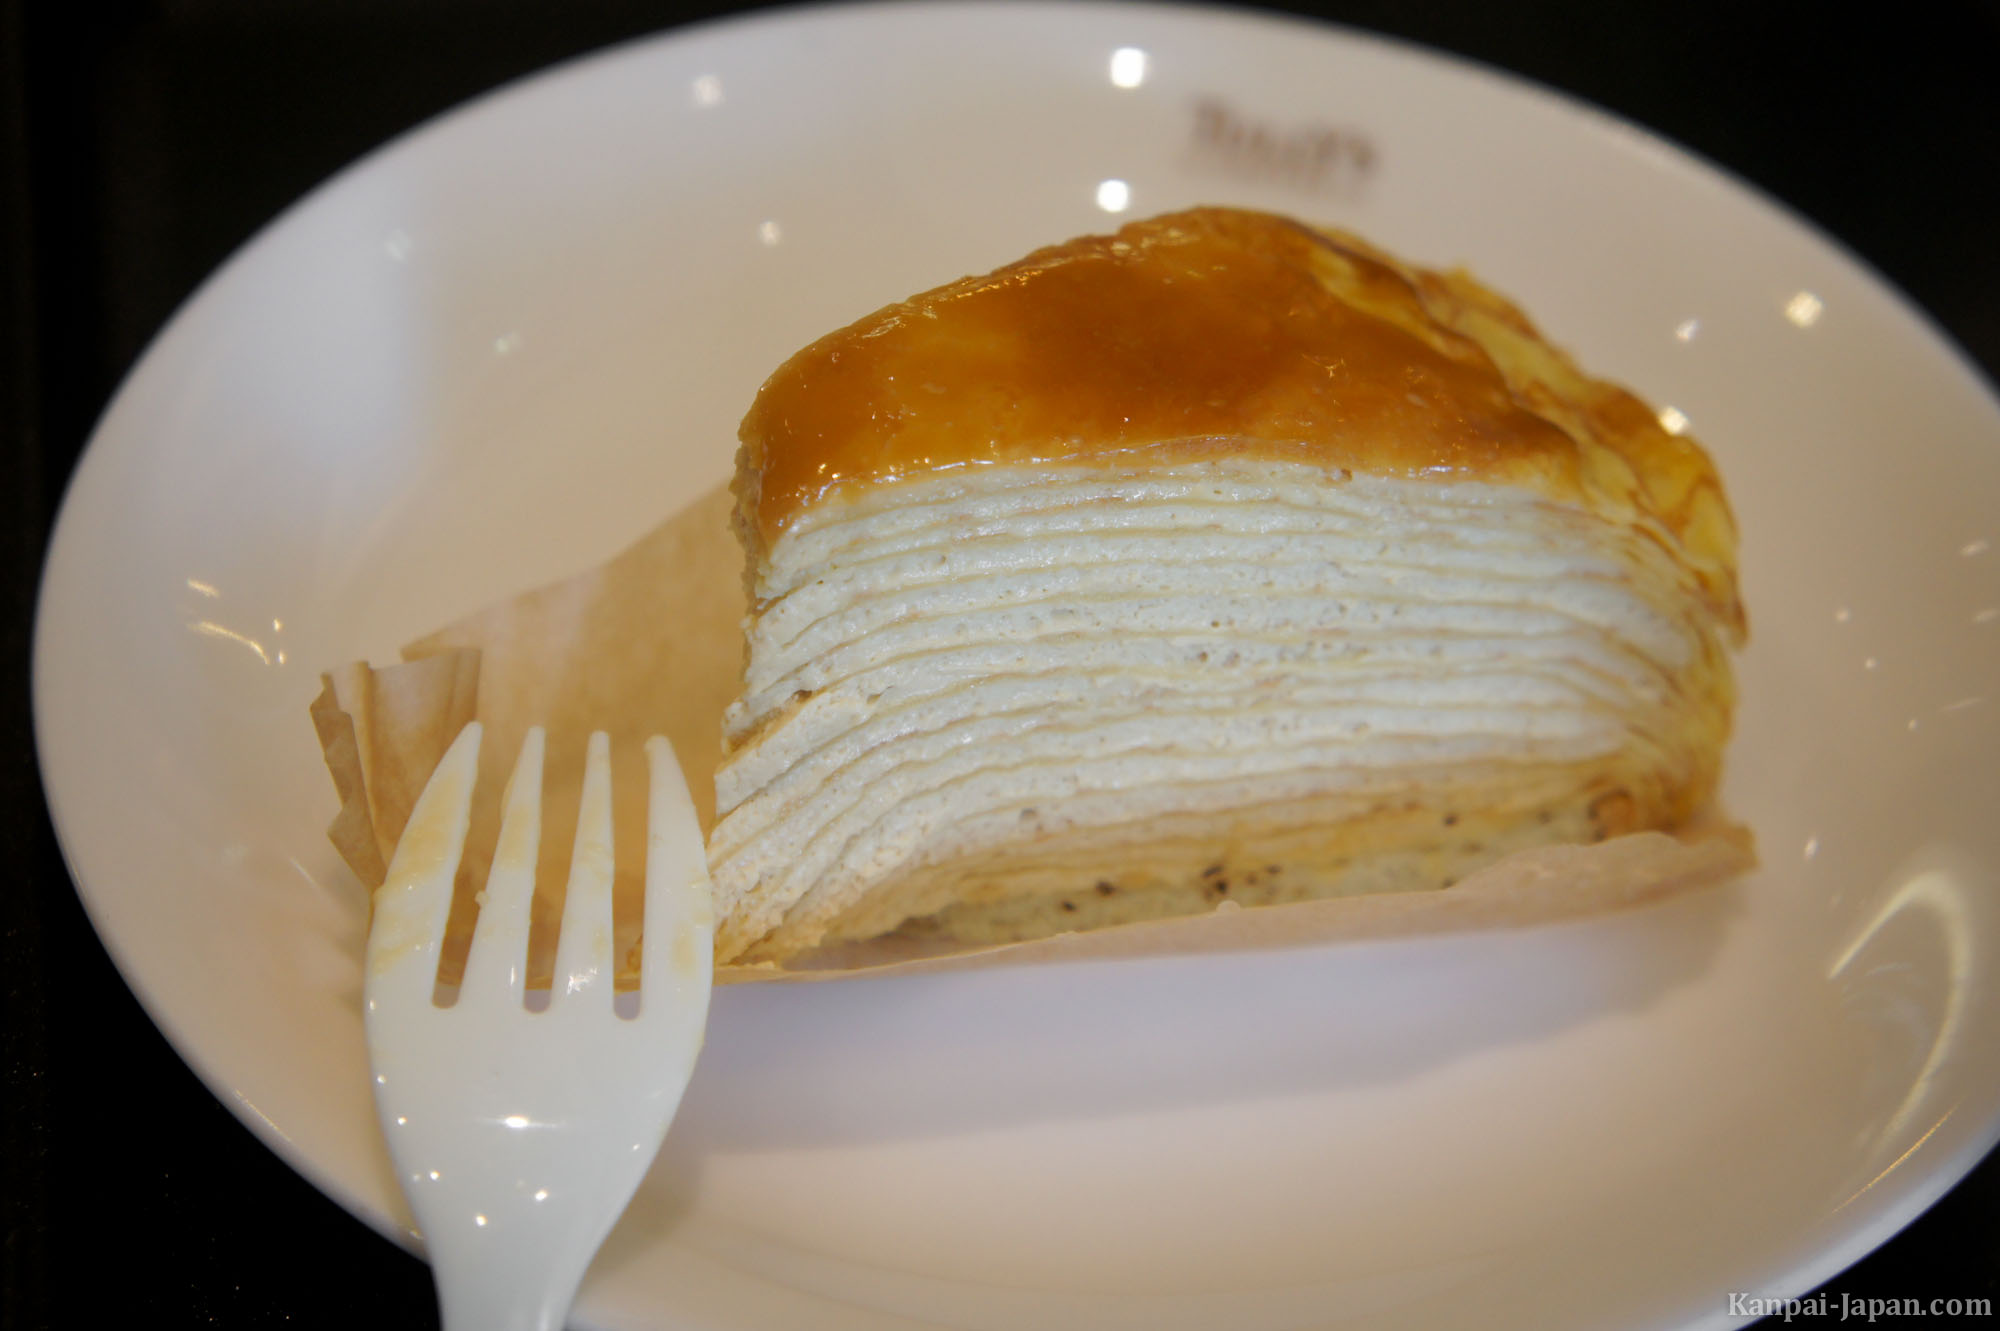 Japanese Layered Cake Recipe: Japanese Desserts And Sweets